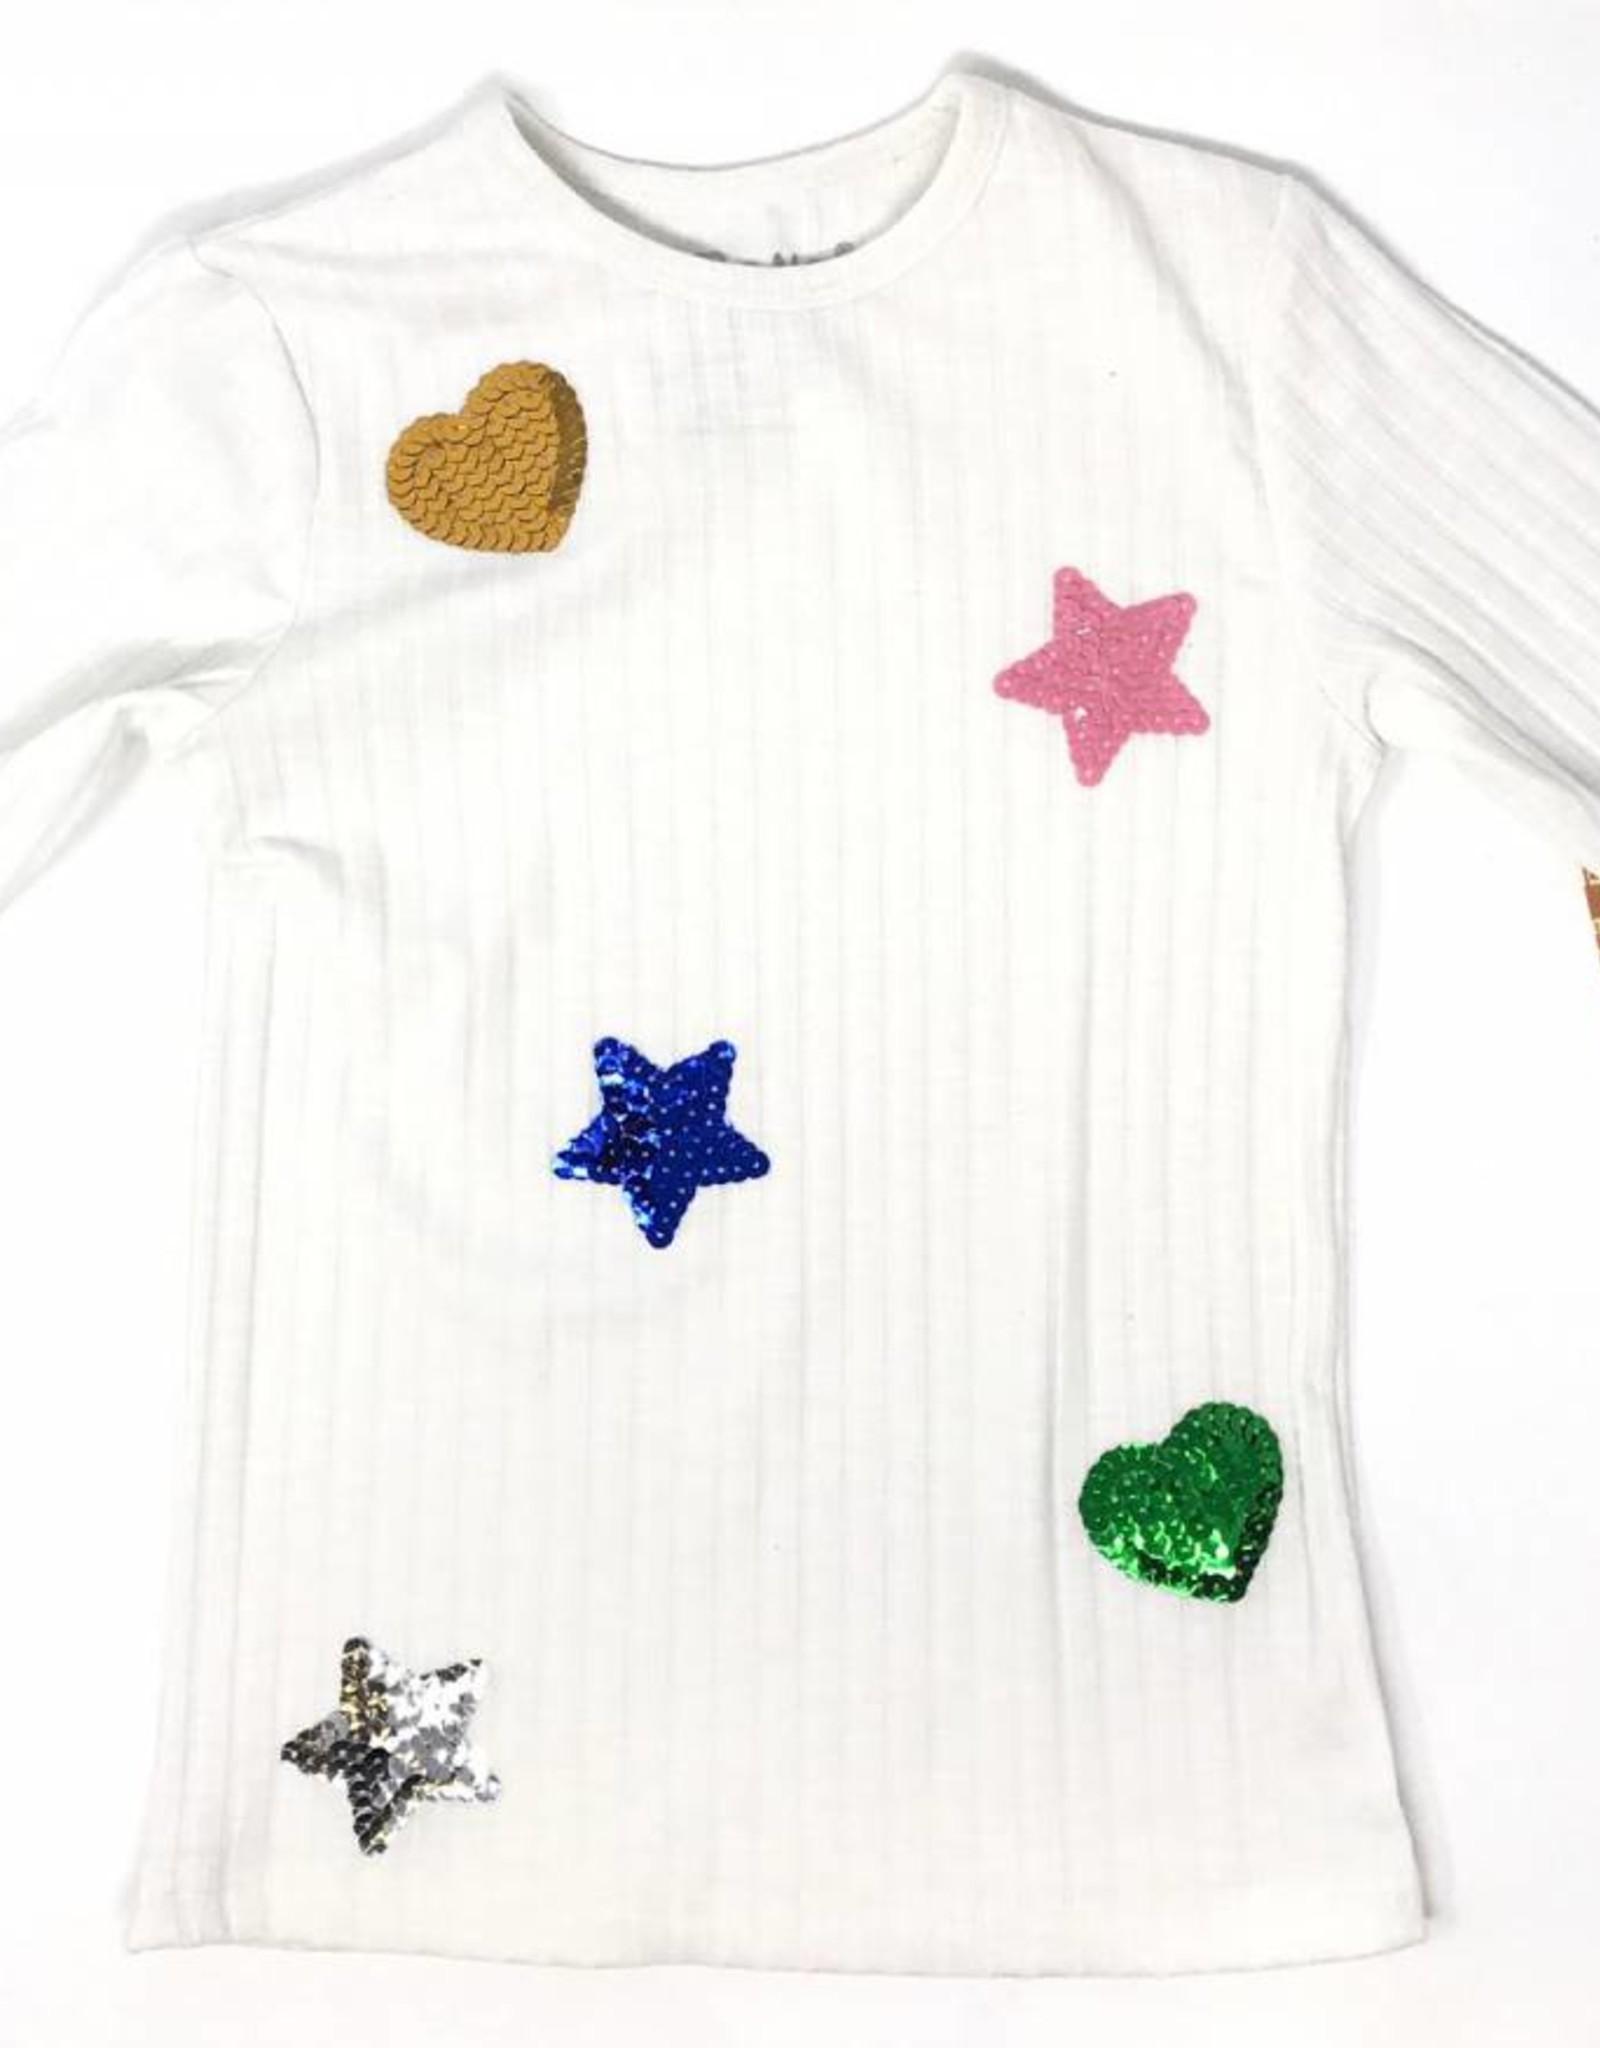 Boboya Boboya Heart and Star Sequin Patch Top